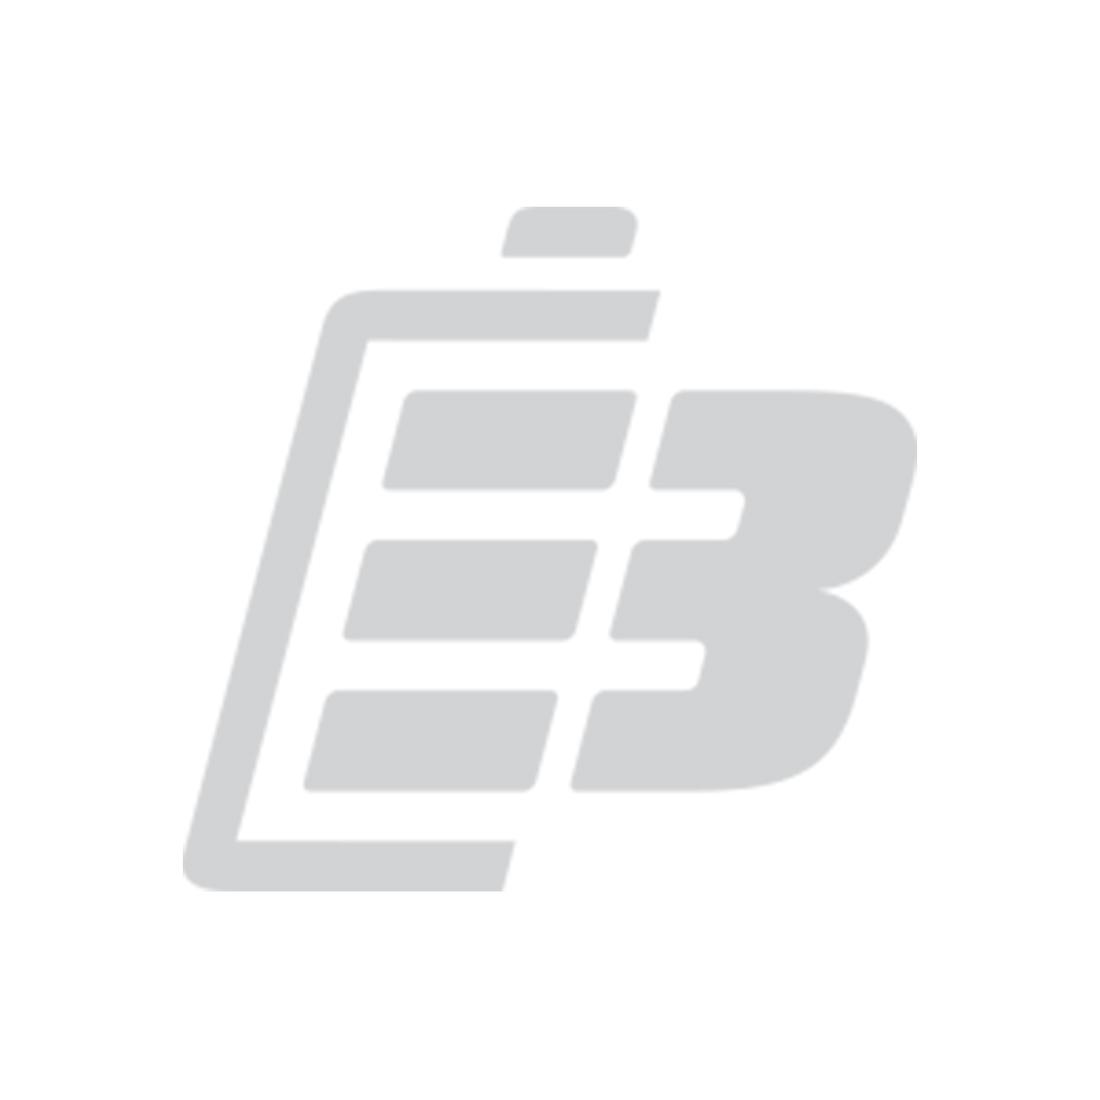 CSB LEAD BATTERY HRL1210W_1